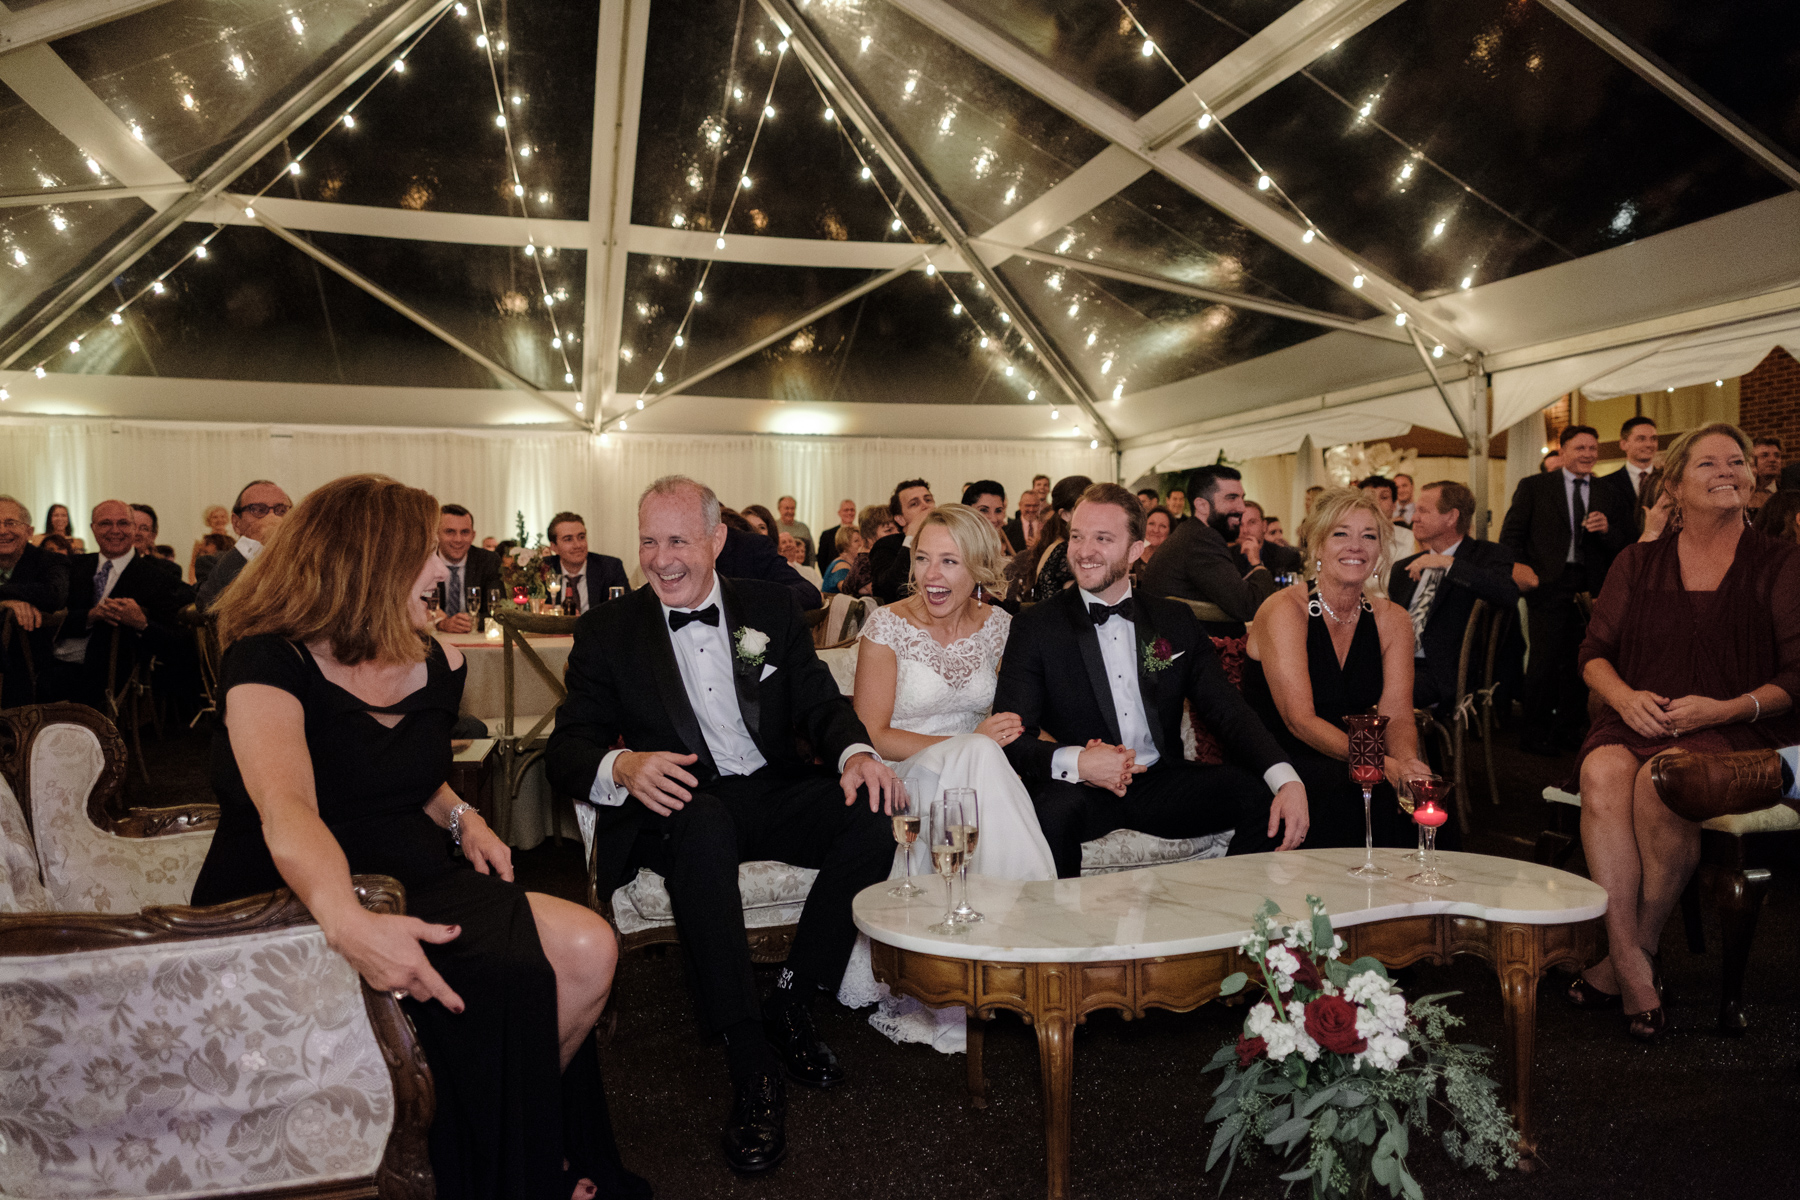 2017_BAP_KalliMatt_Gleneagles_CountryClub_Lemont_Wedding-82.jpg